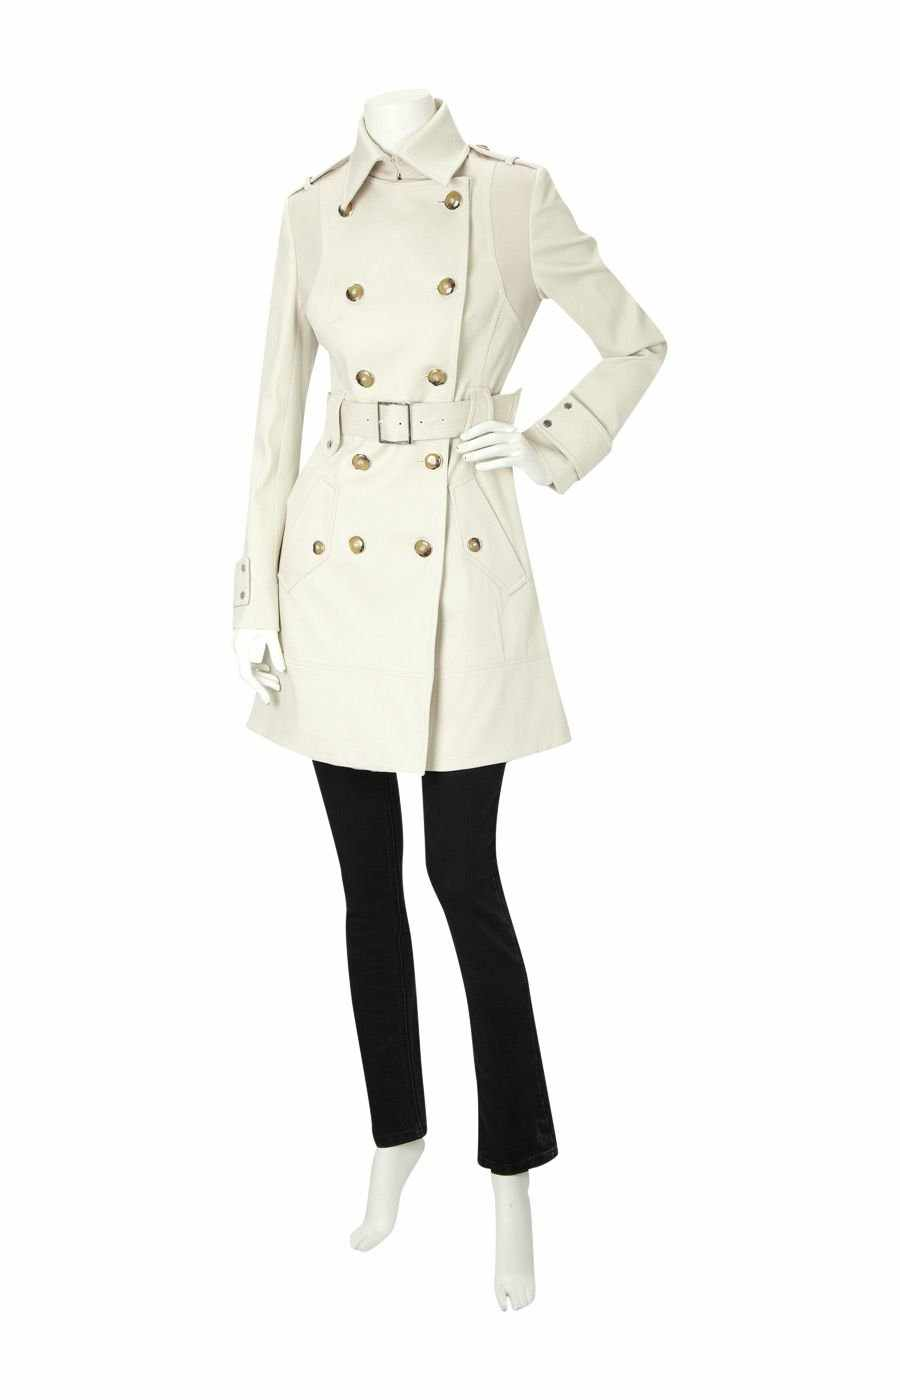 296083436_851 Long winter coats